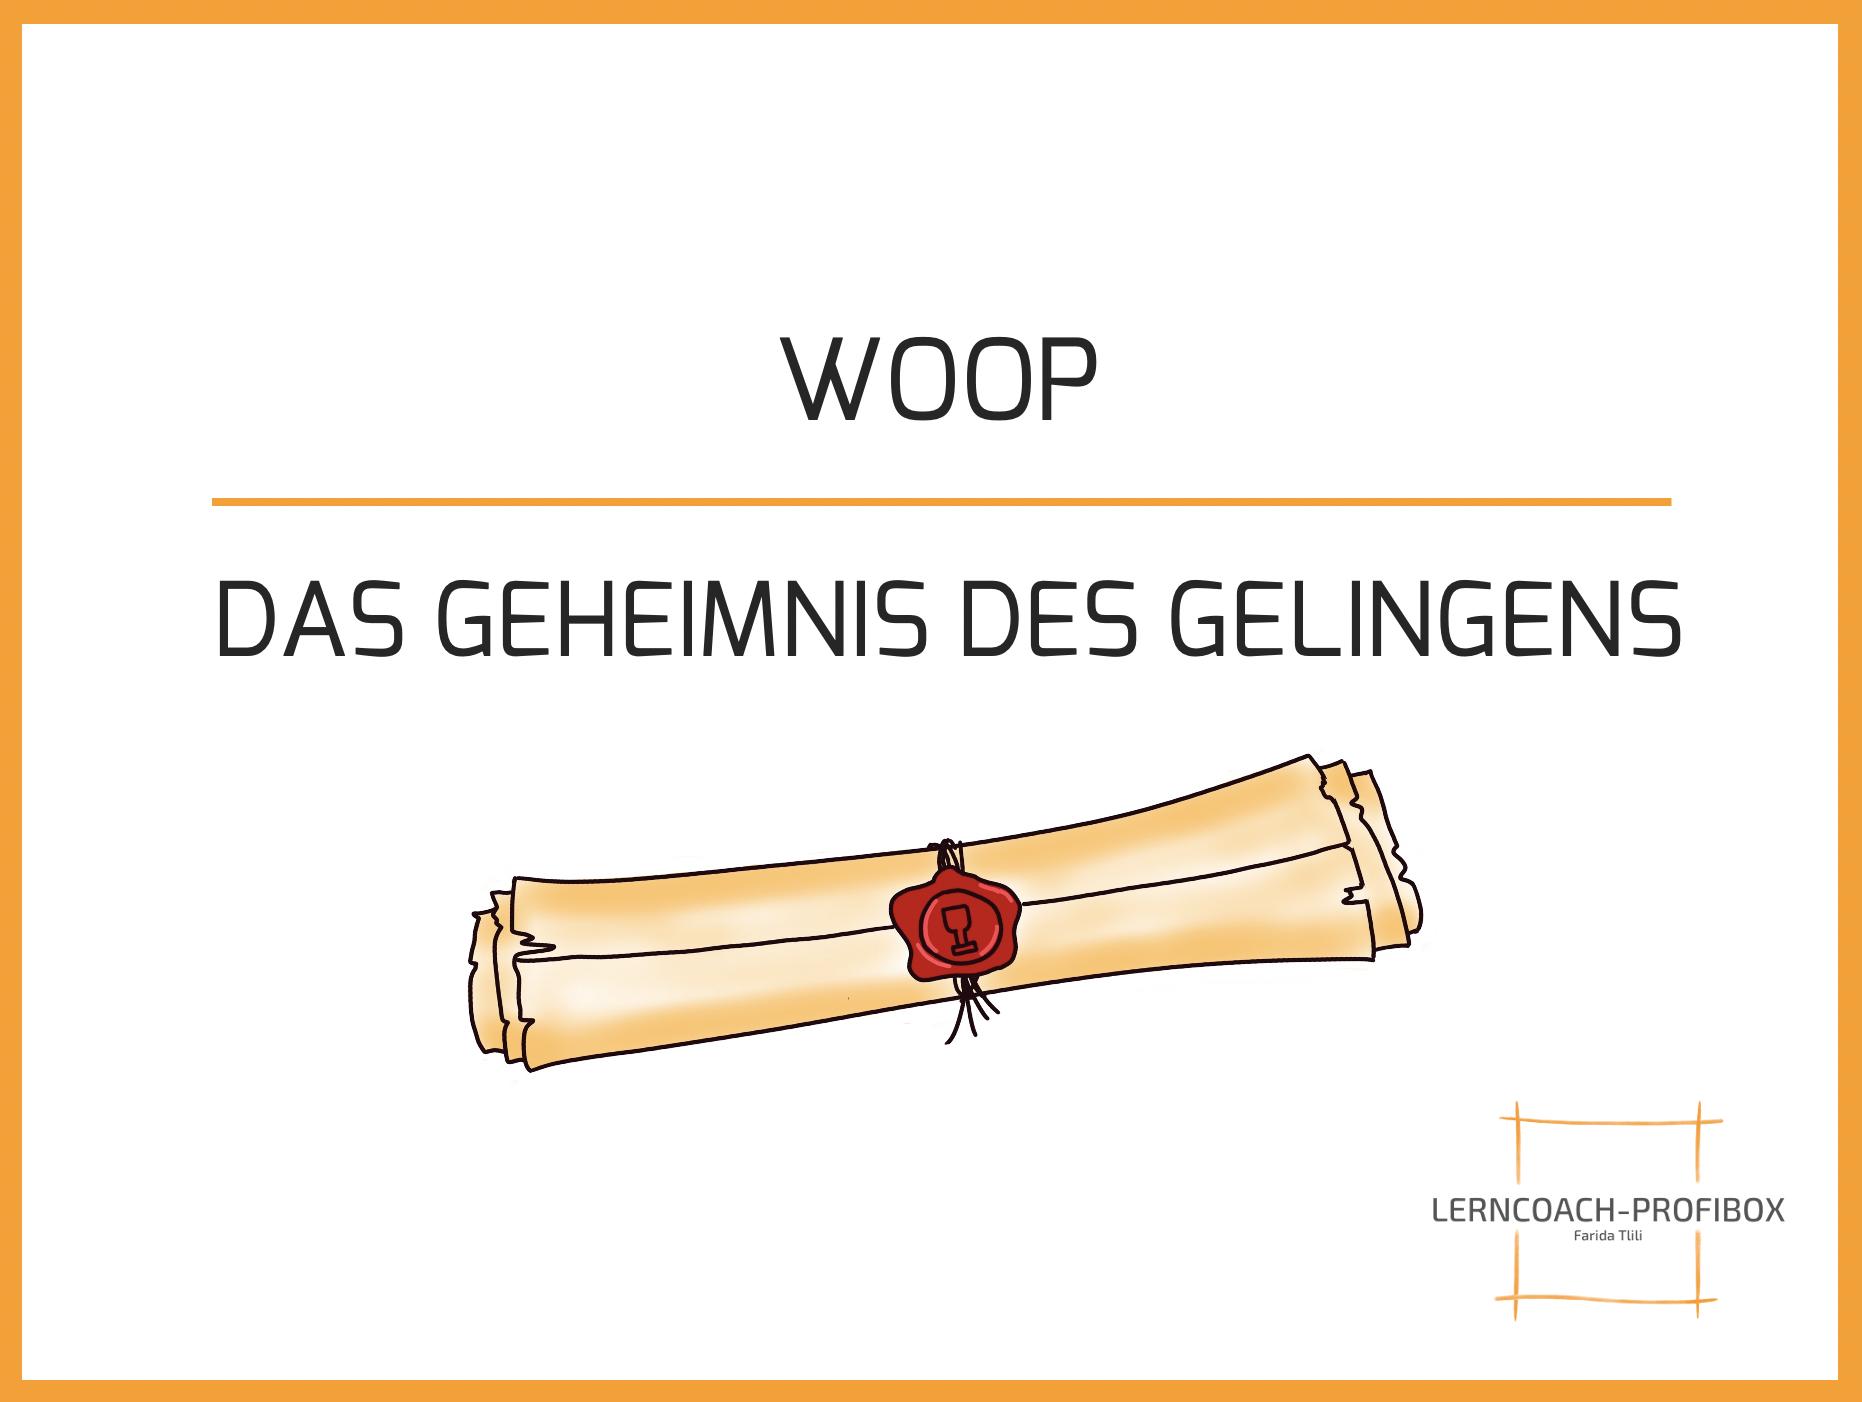 WOOP - Das Coaching-Tool als Videokurs